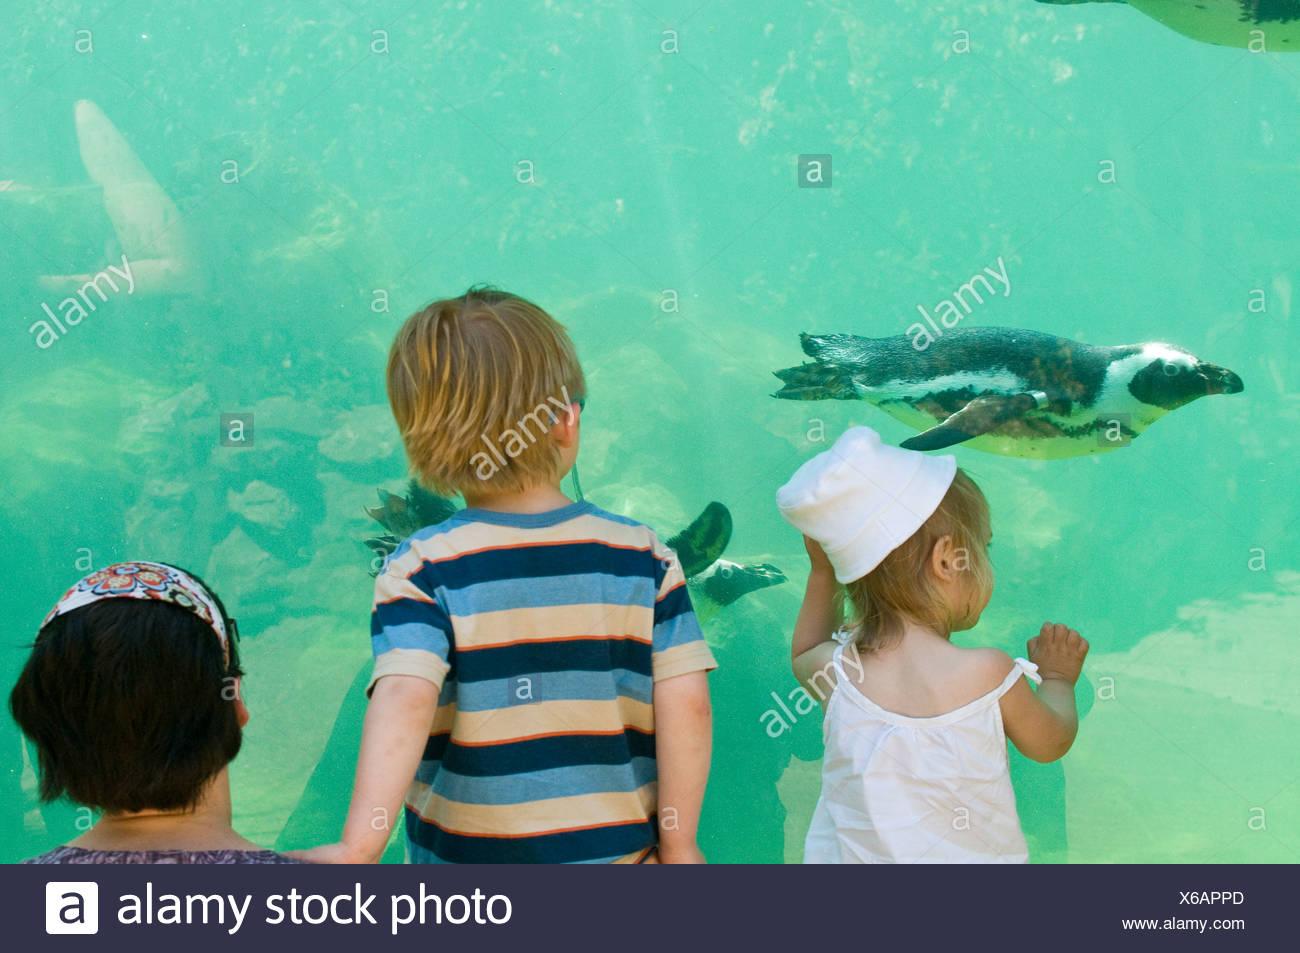 Toddlers watching Magellanic Penguins swimming underwater at Zoo - Stock Image